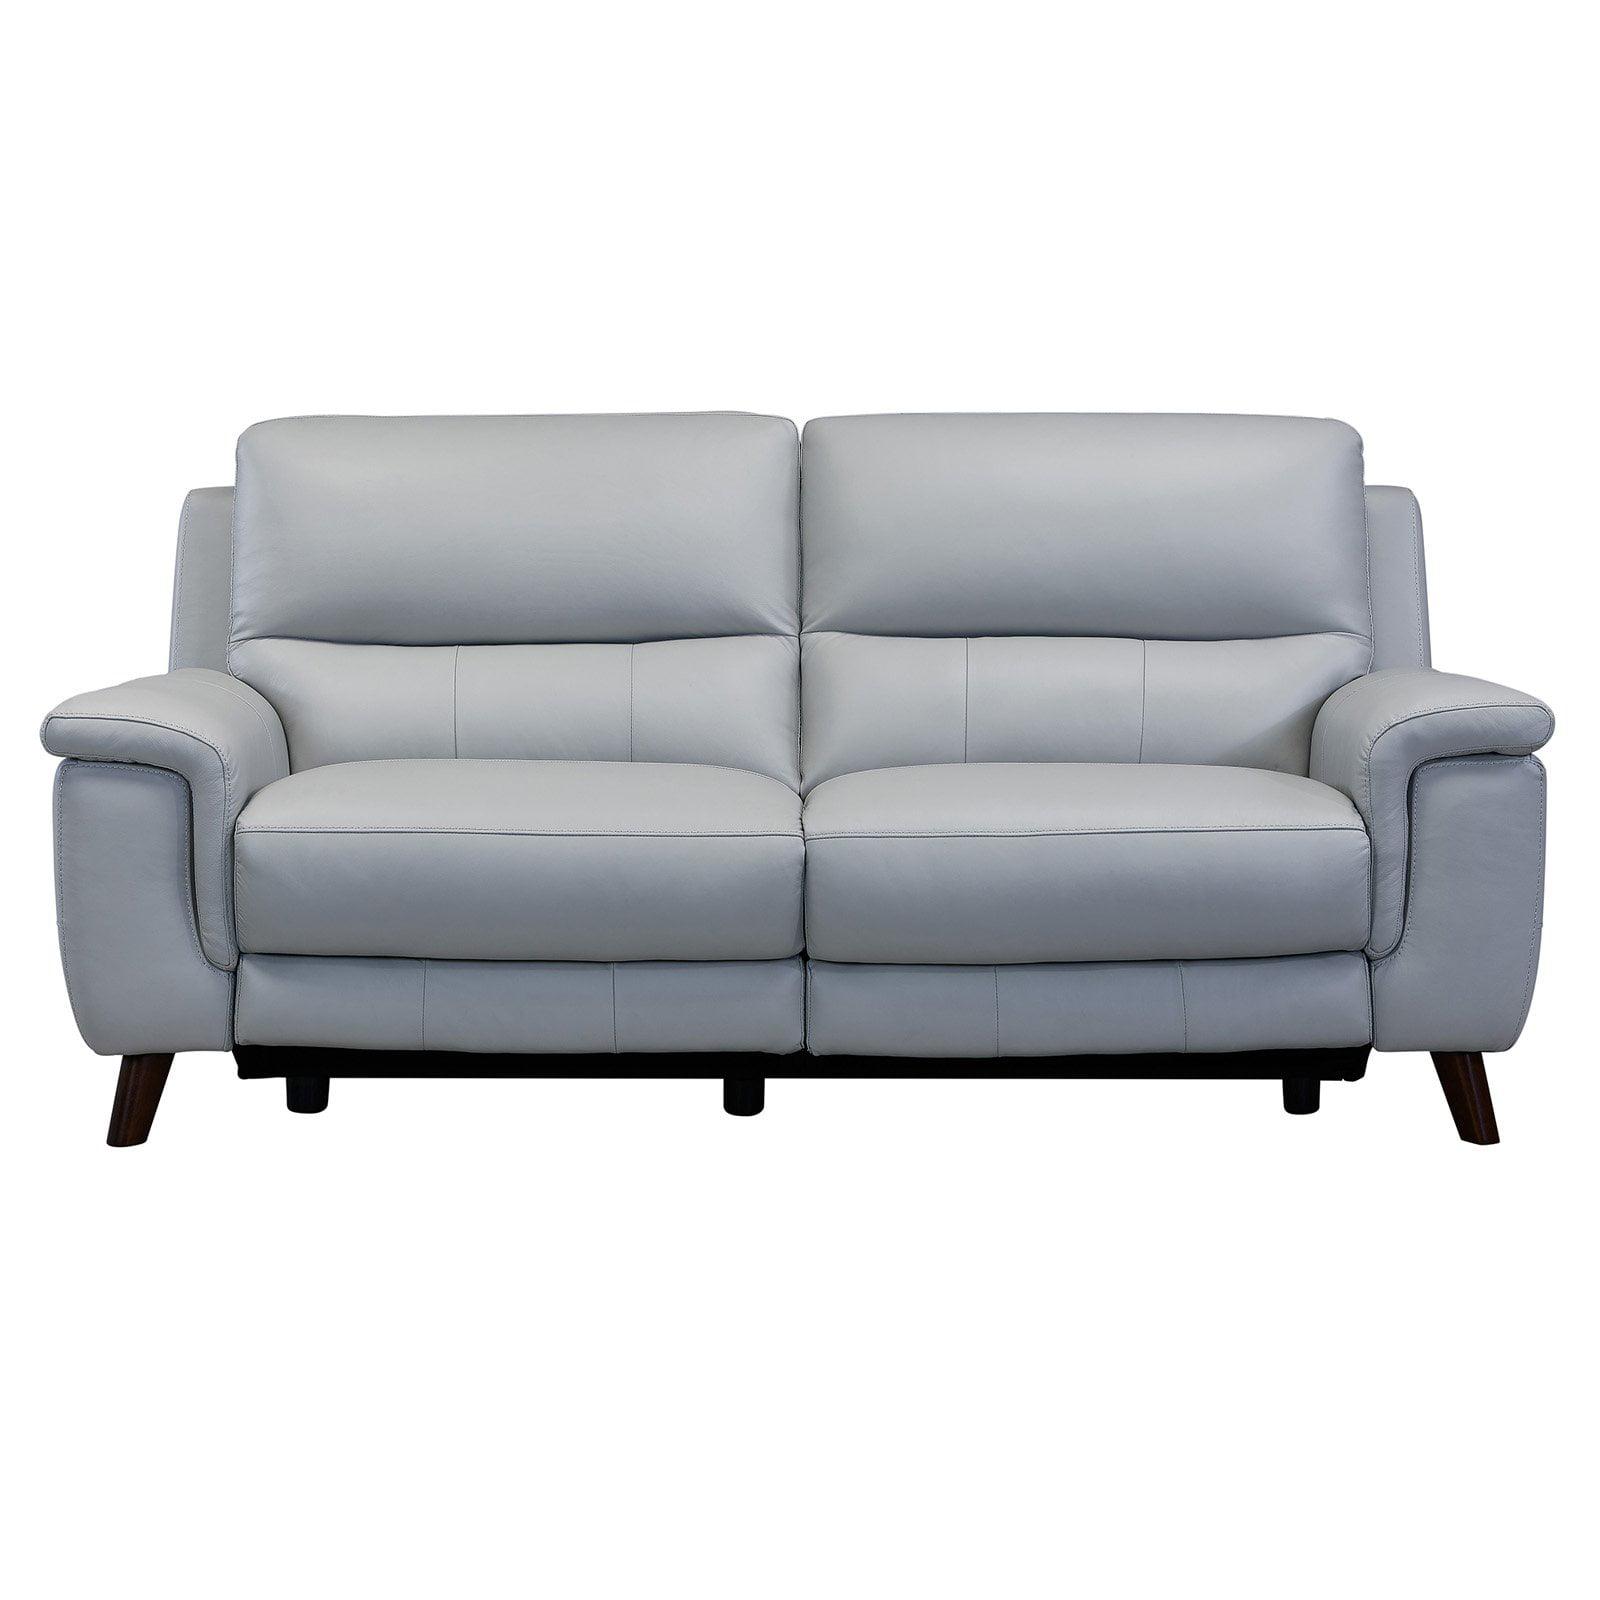 Lizette Contemporary Top Grain Leather Dove Grey Power Recliner Sofa With Usb Walmart Com